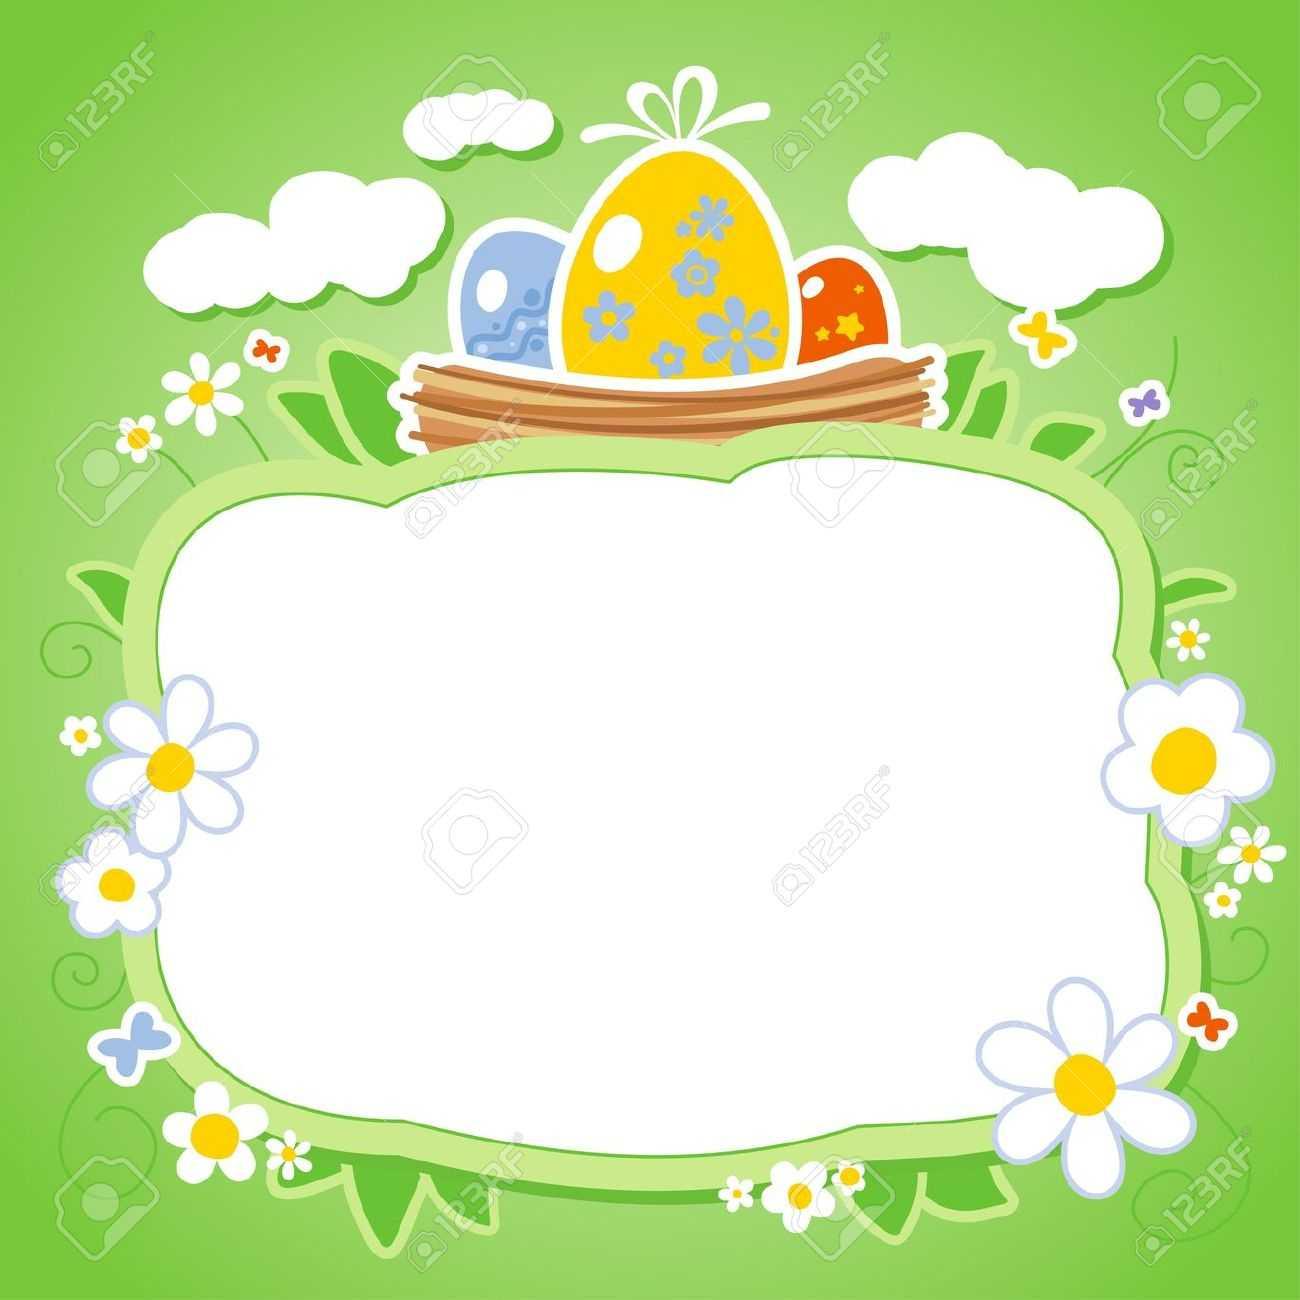 Easter Card Designs Ks2 Easter Card Template Design Easter Inside Easter Card Template Ks2